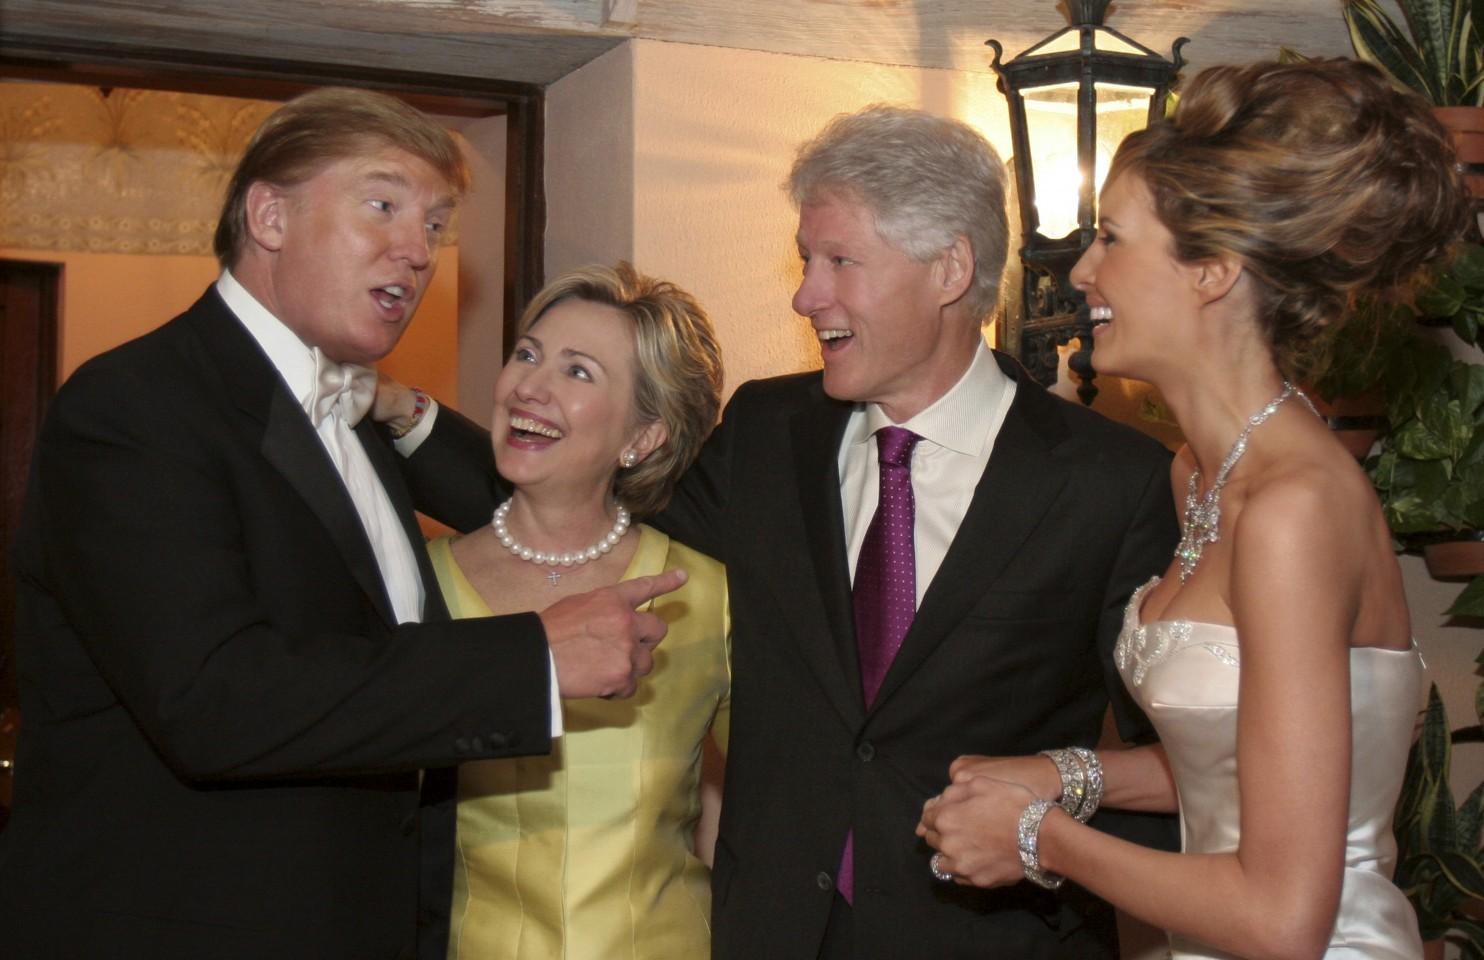 TrumpClintonsBuddies